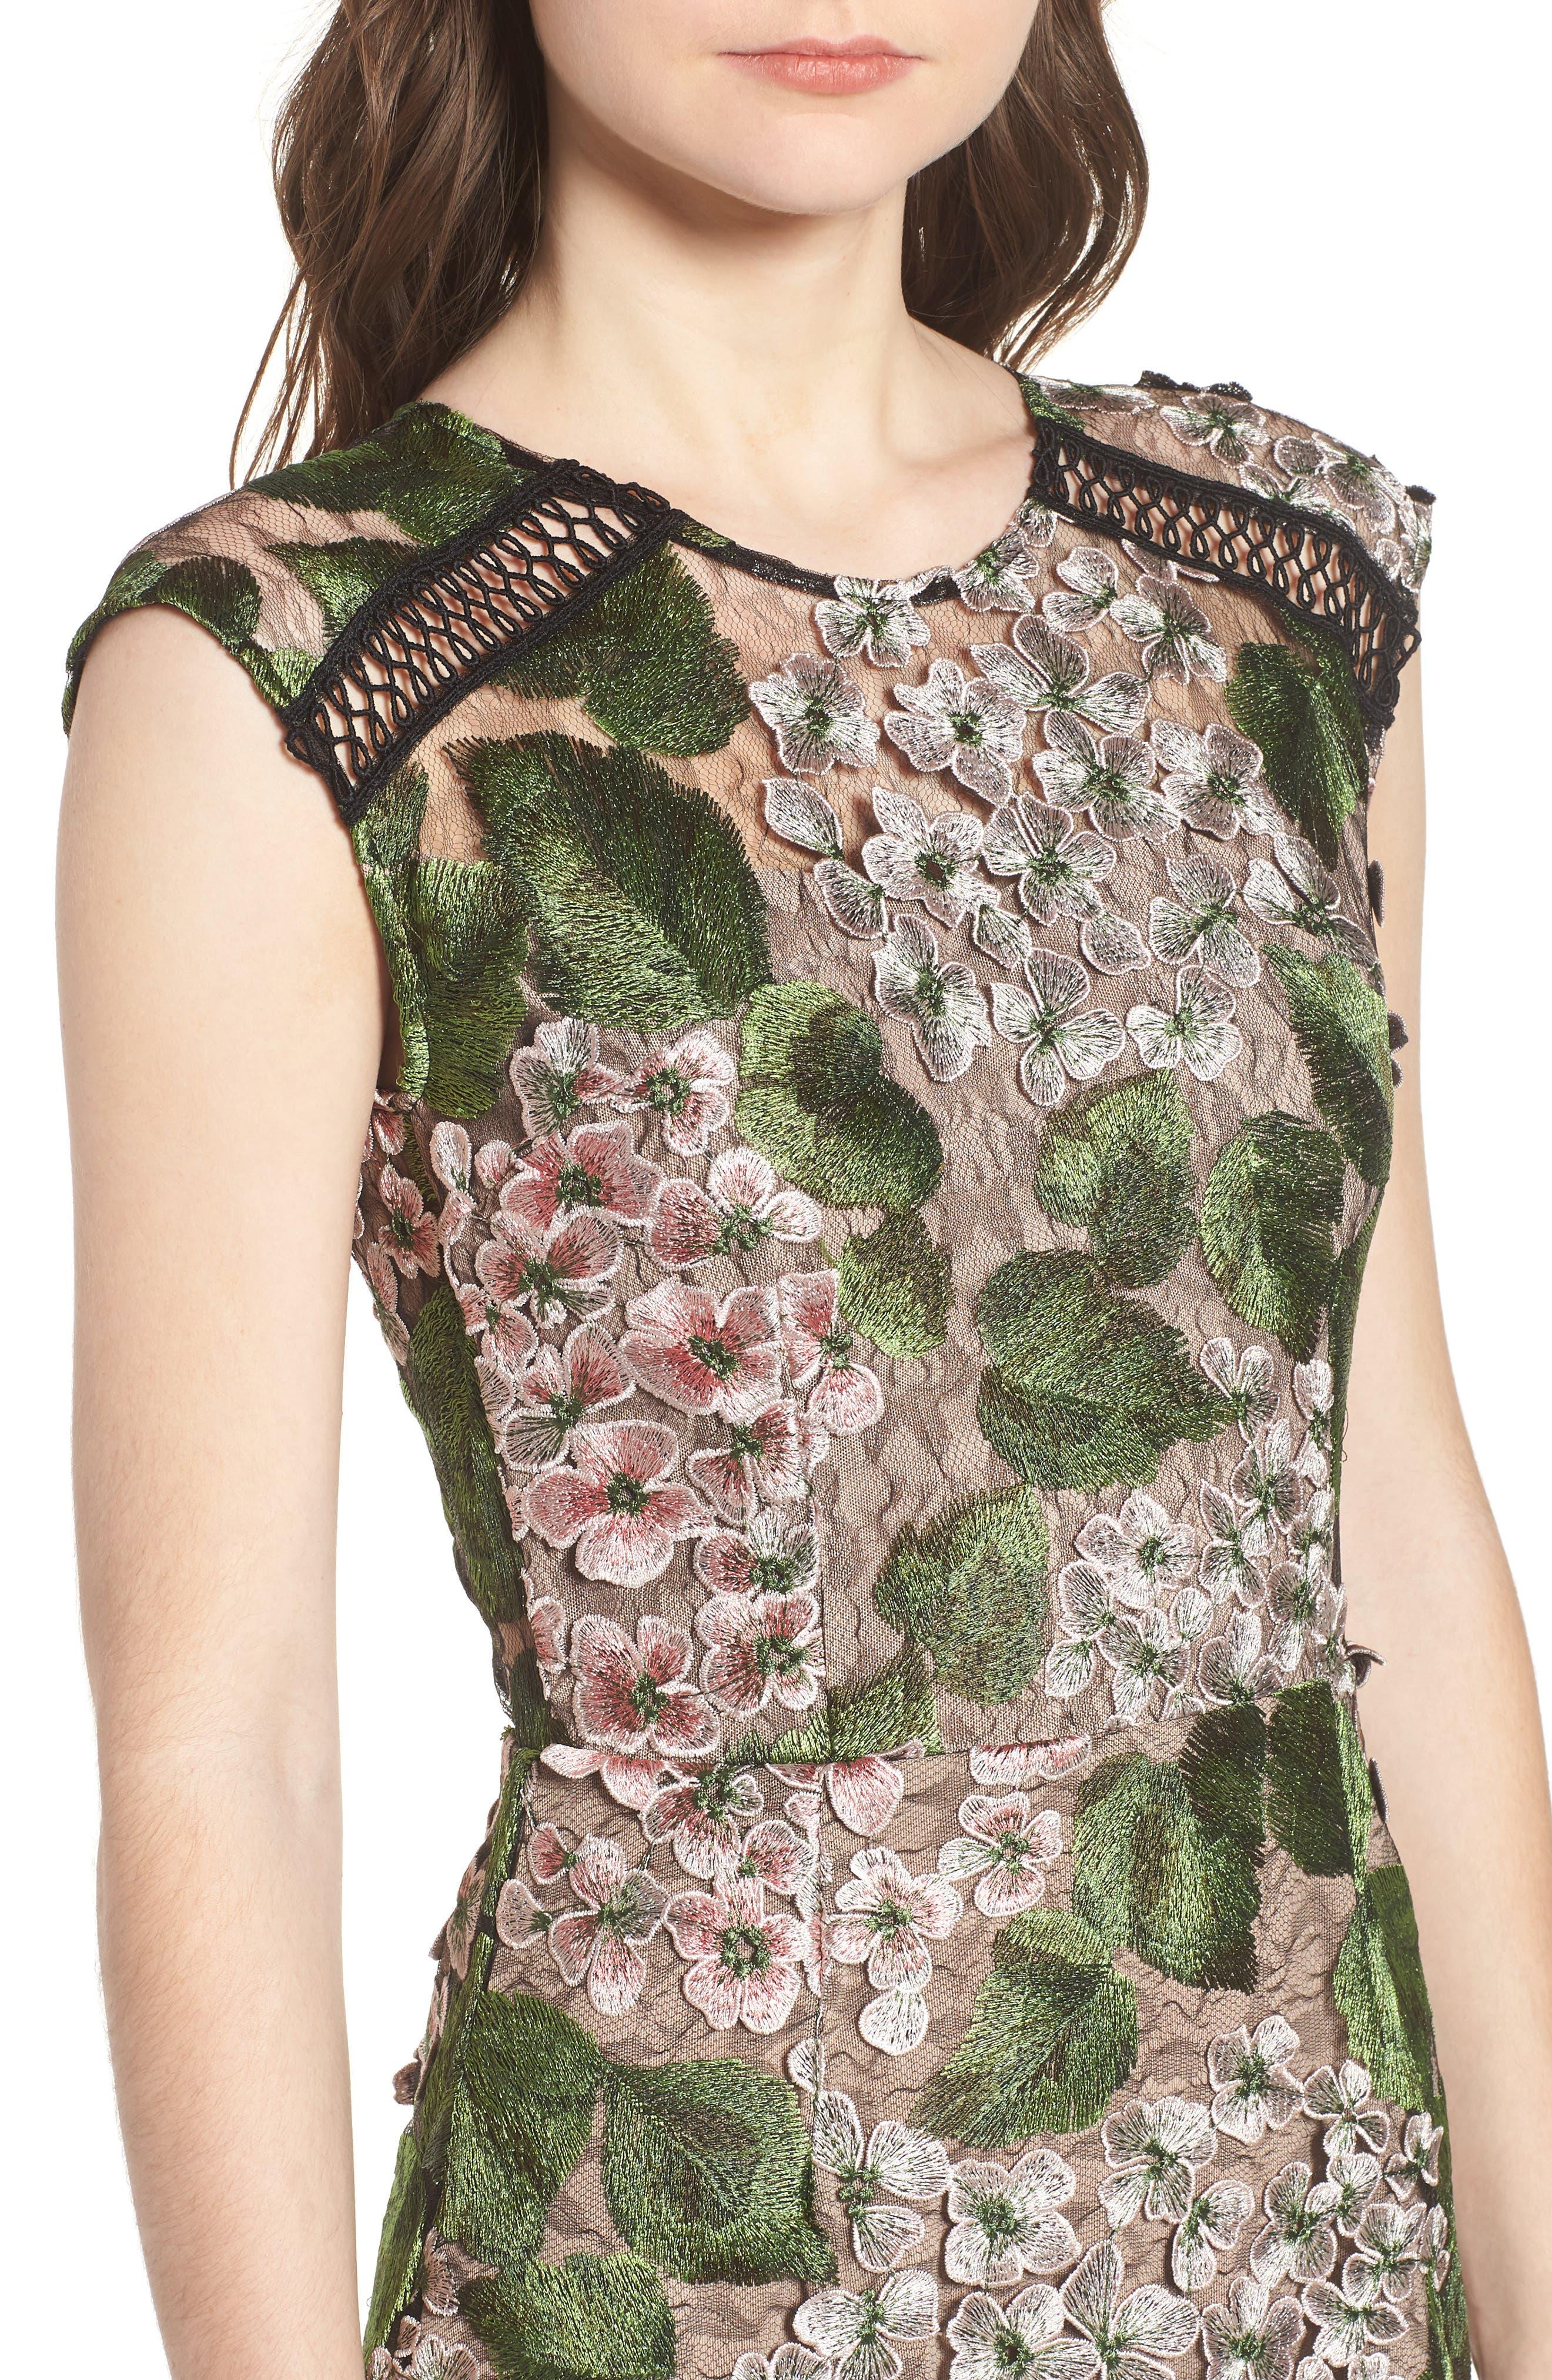 Cherry Hydrangea Lace Dress,                             Alternate thumbnail 4, color,                             Multicolor Pink